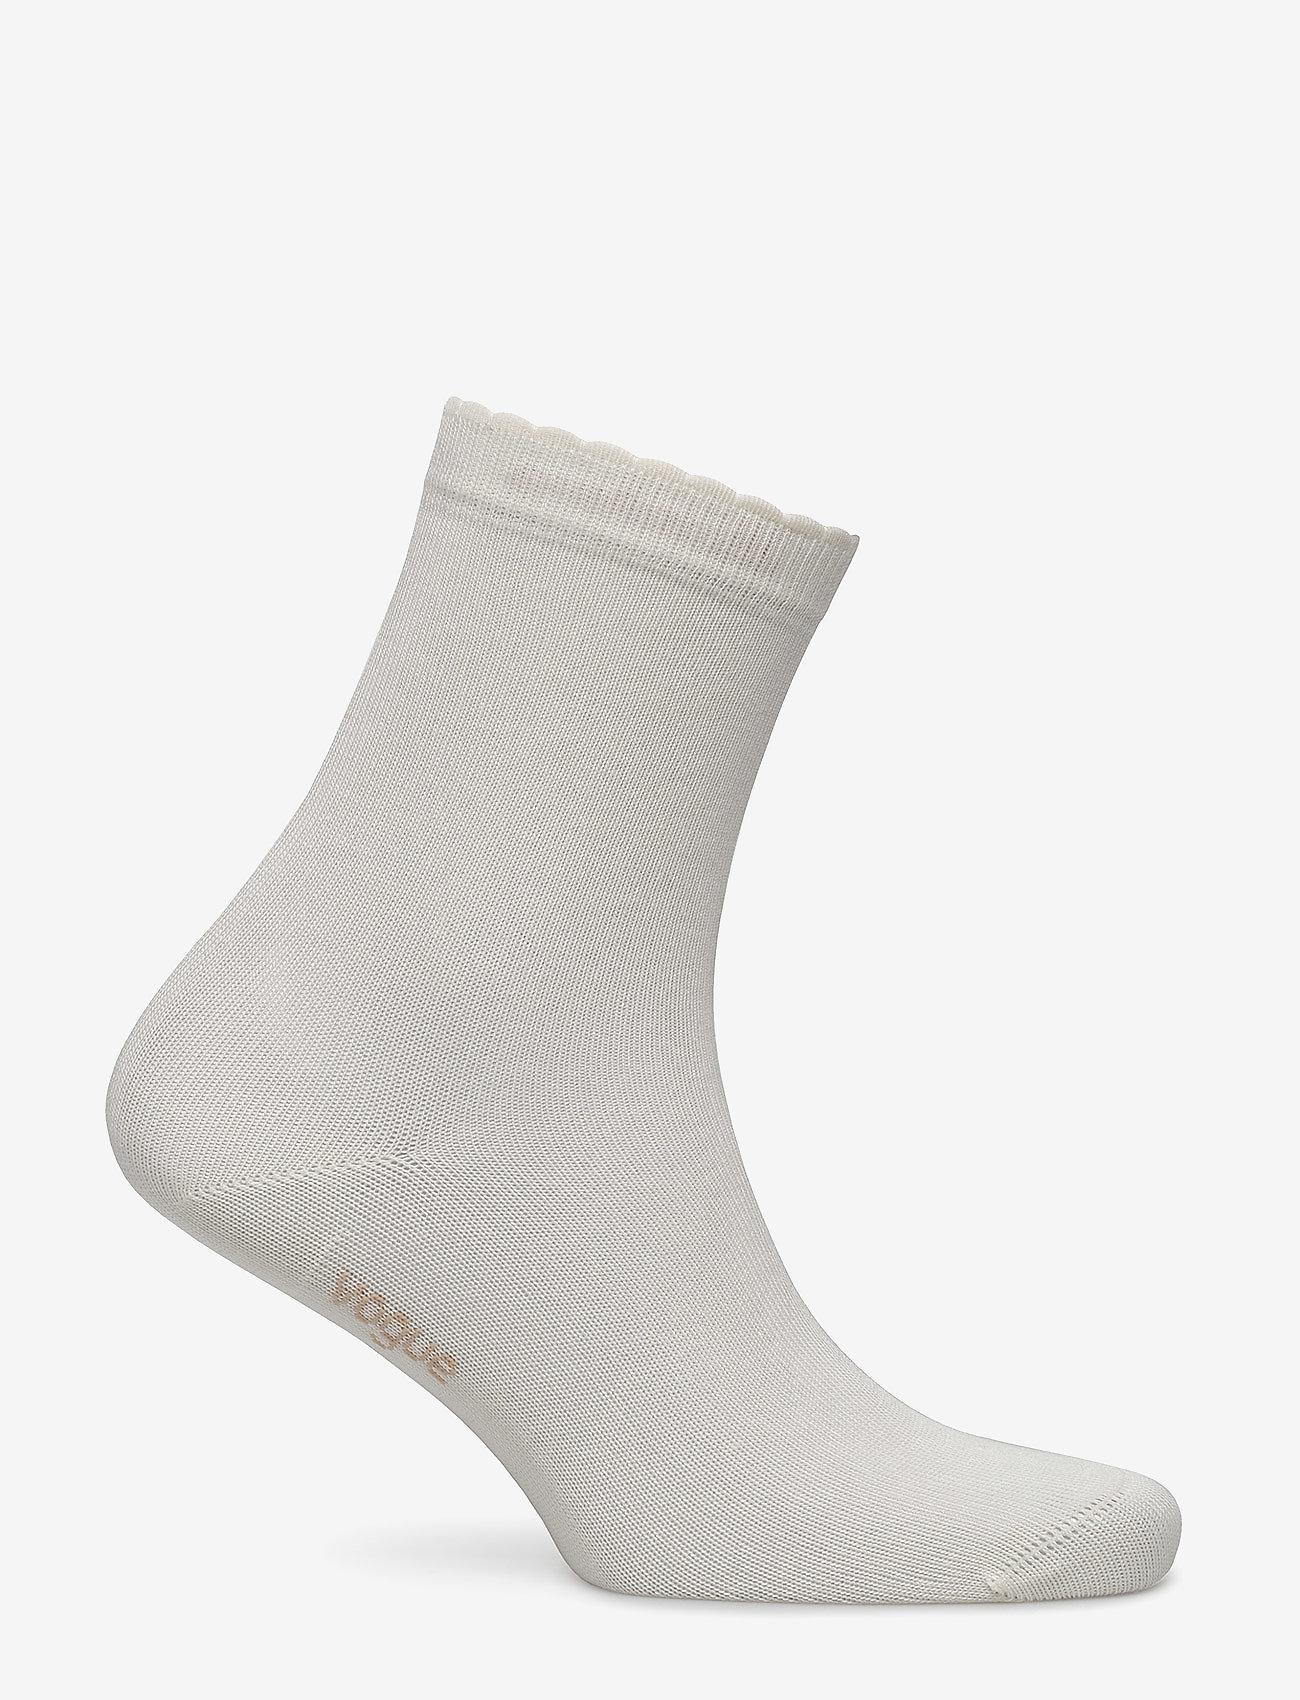 Vogue - Ladies anklesock, Bamboo Socks - socks - off-white - 1